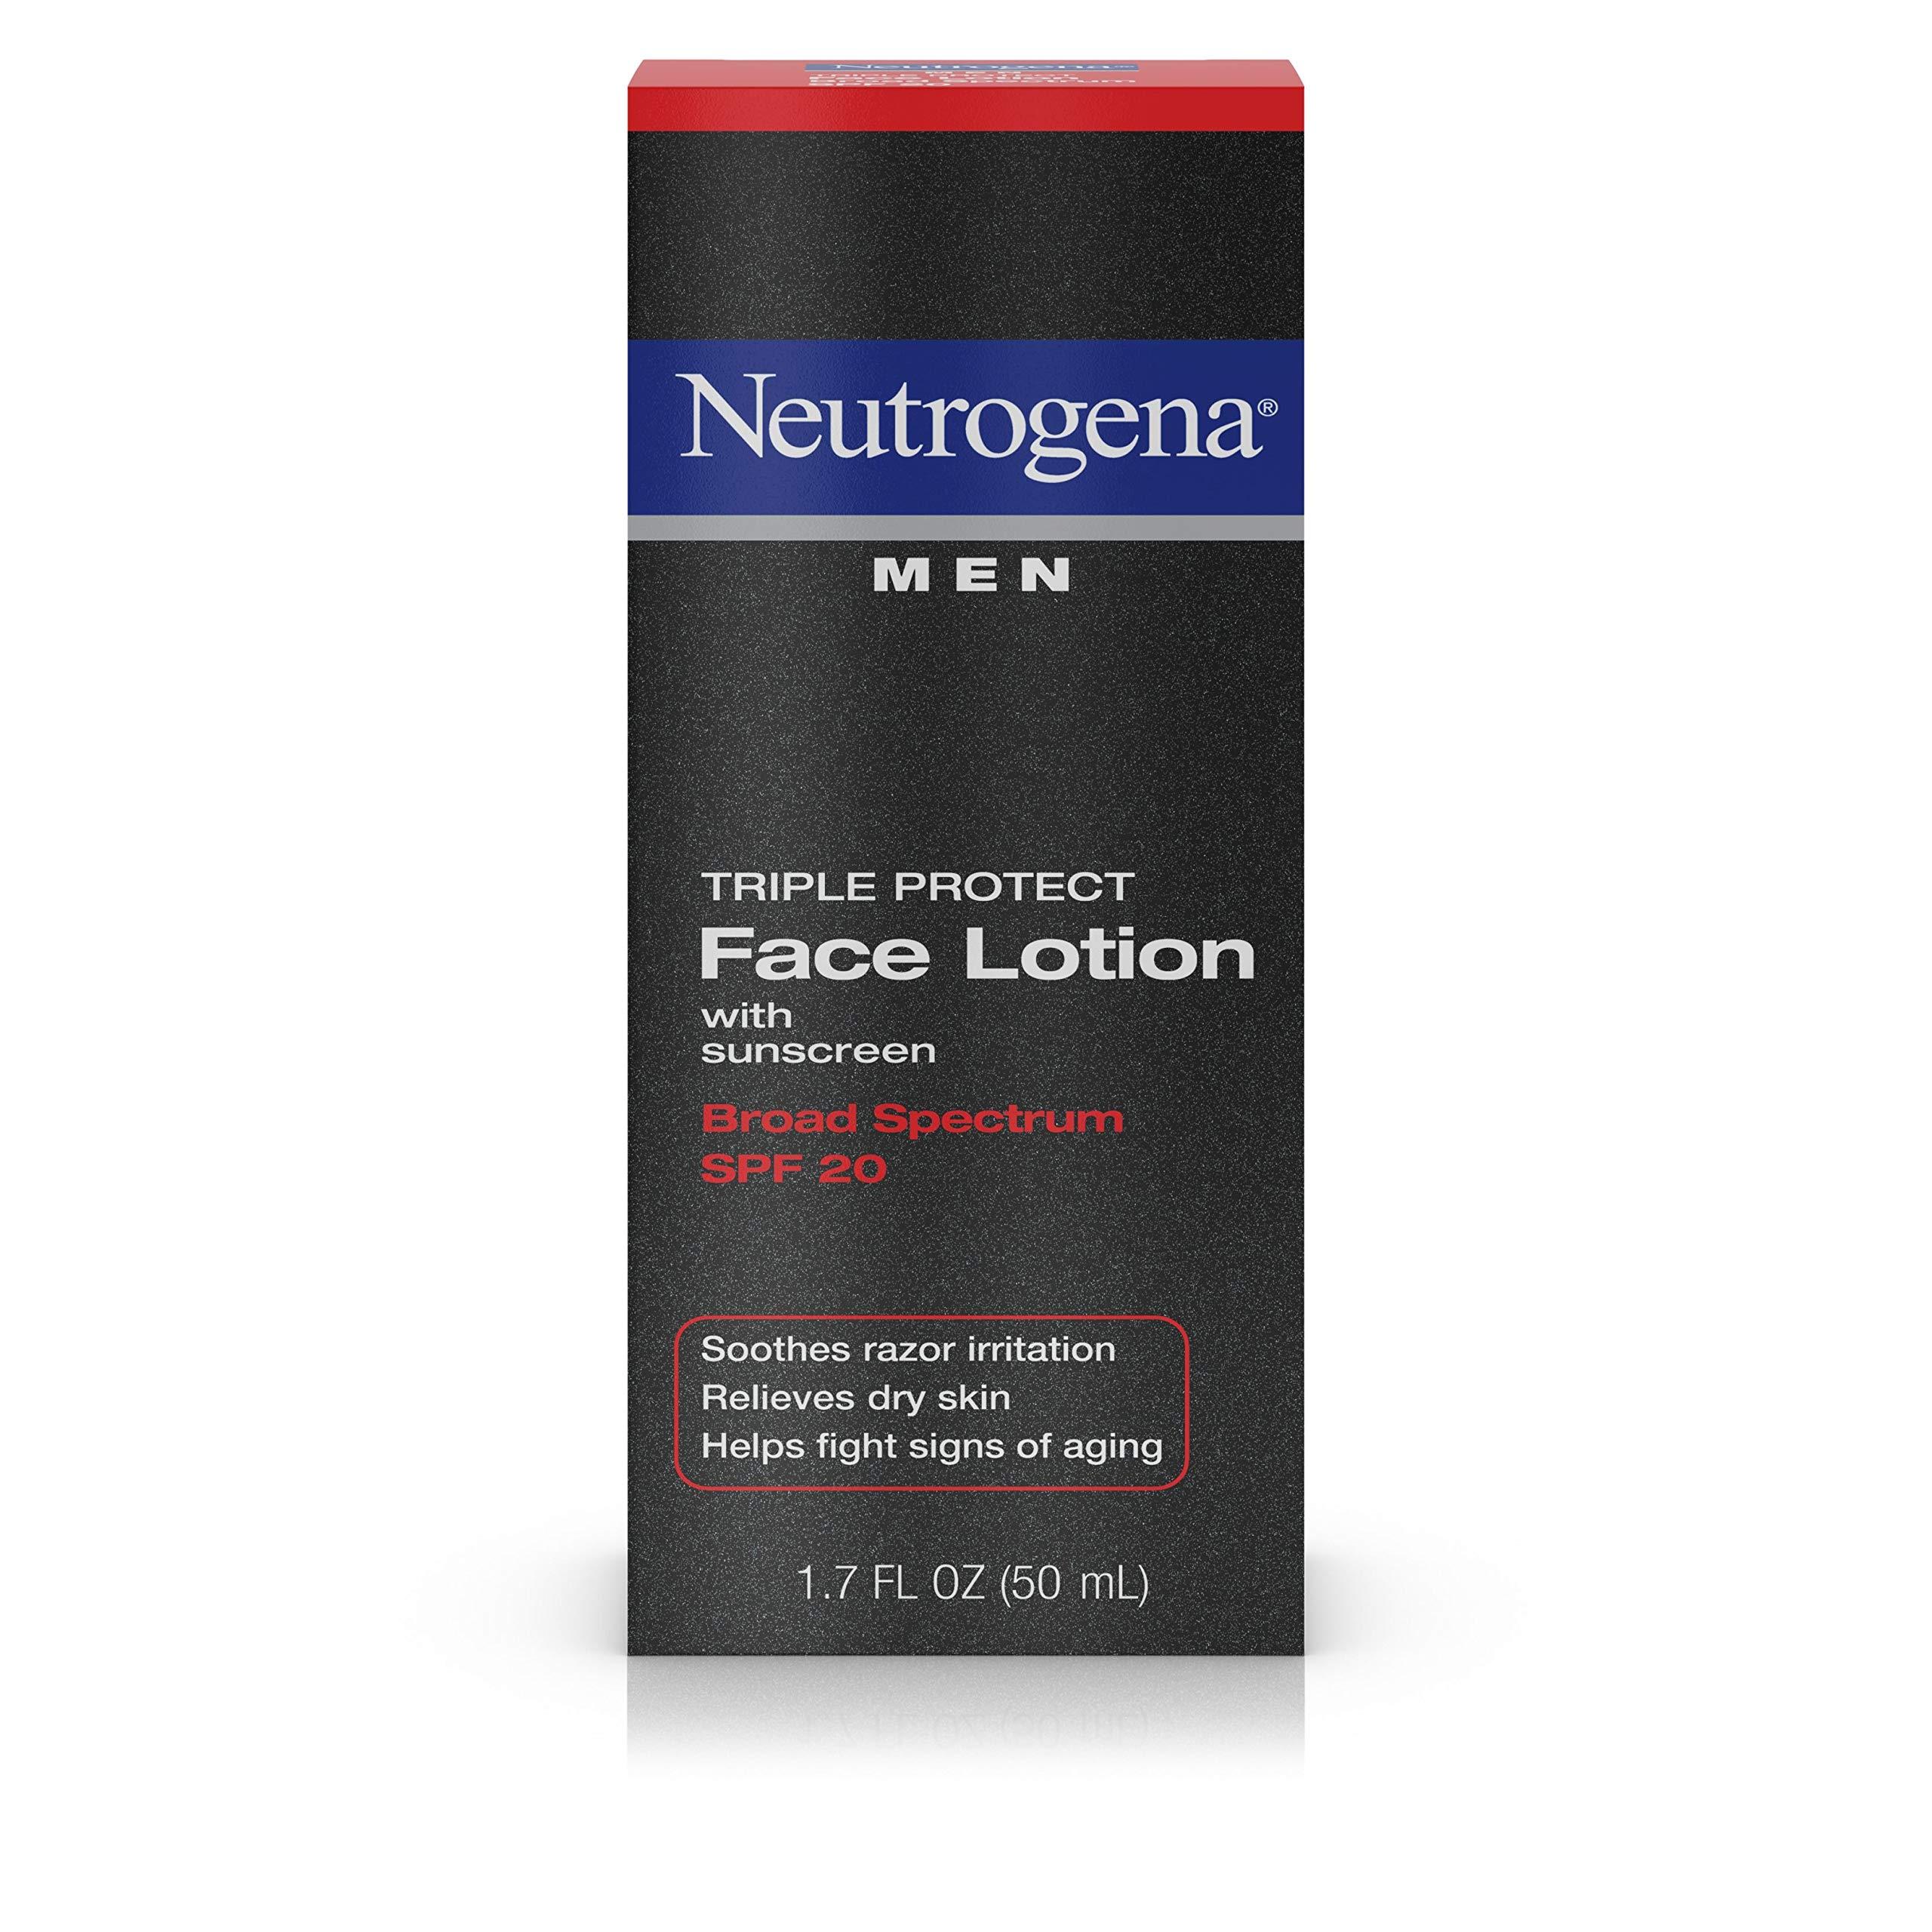 Neutrogena Men Triple Protect Face Lotion Broad Spectrum SPF 20 by Neutrogena